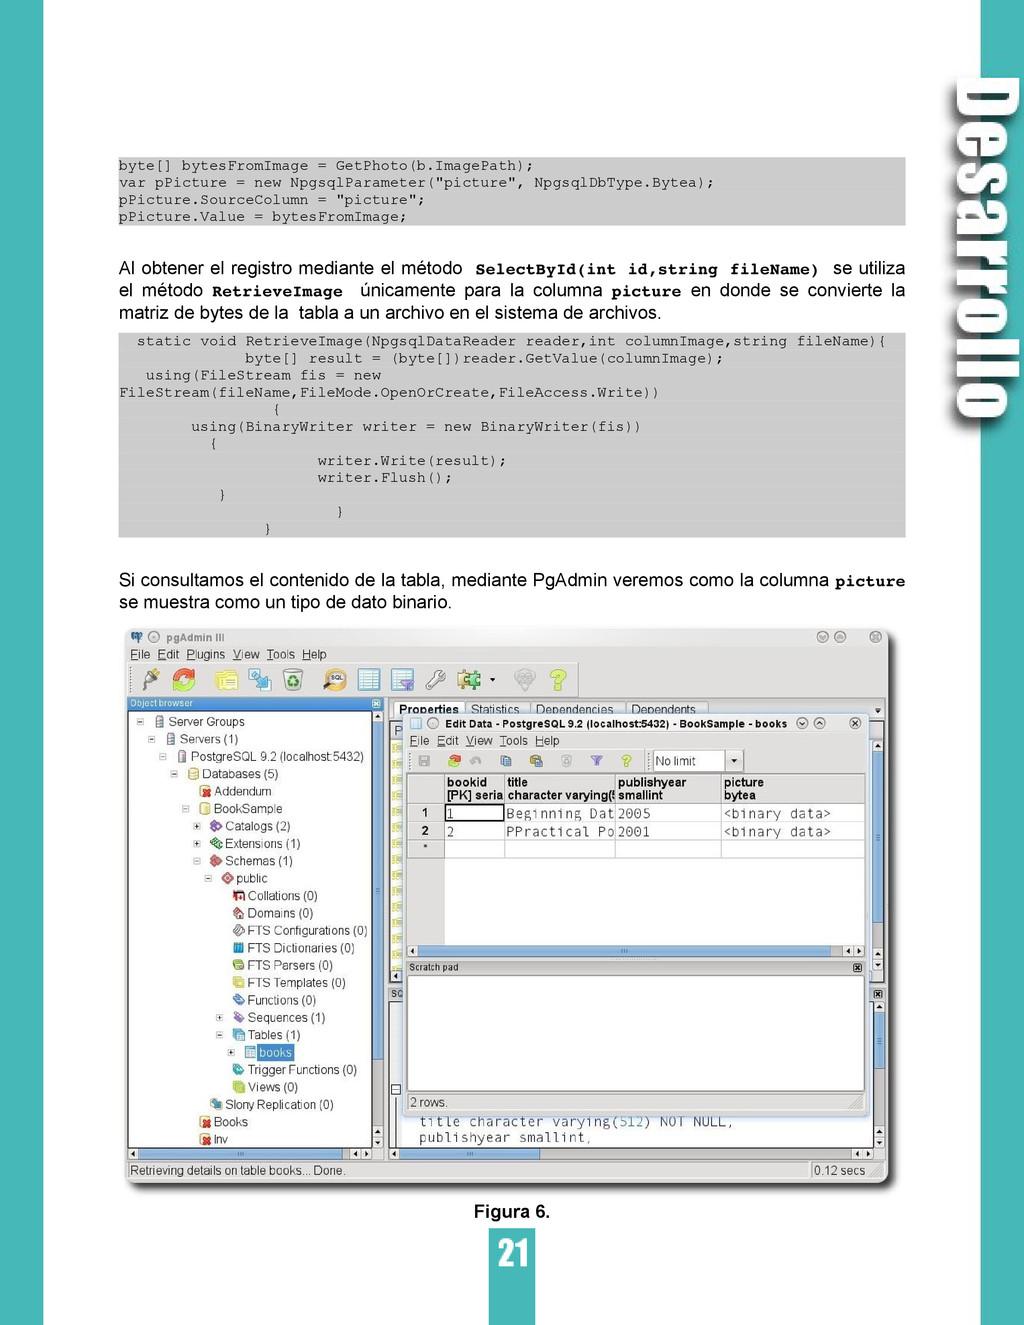 byte[] bytesFromImage = GetPhoto(b.ImagePath); ...